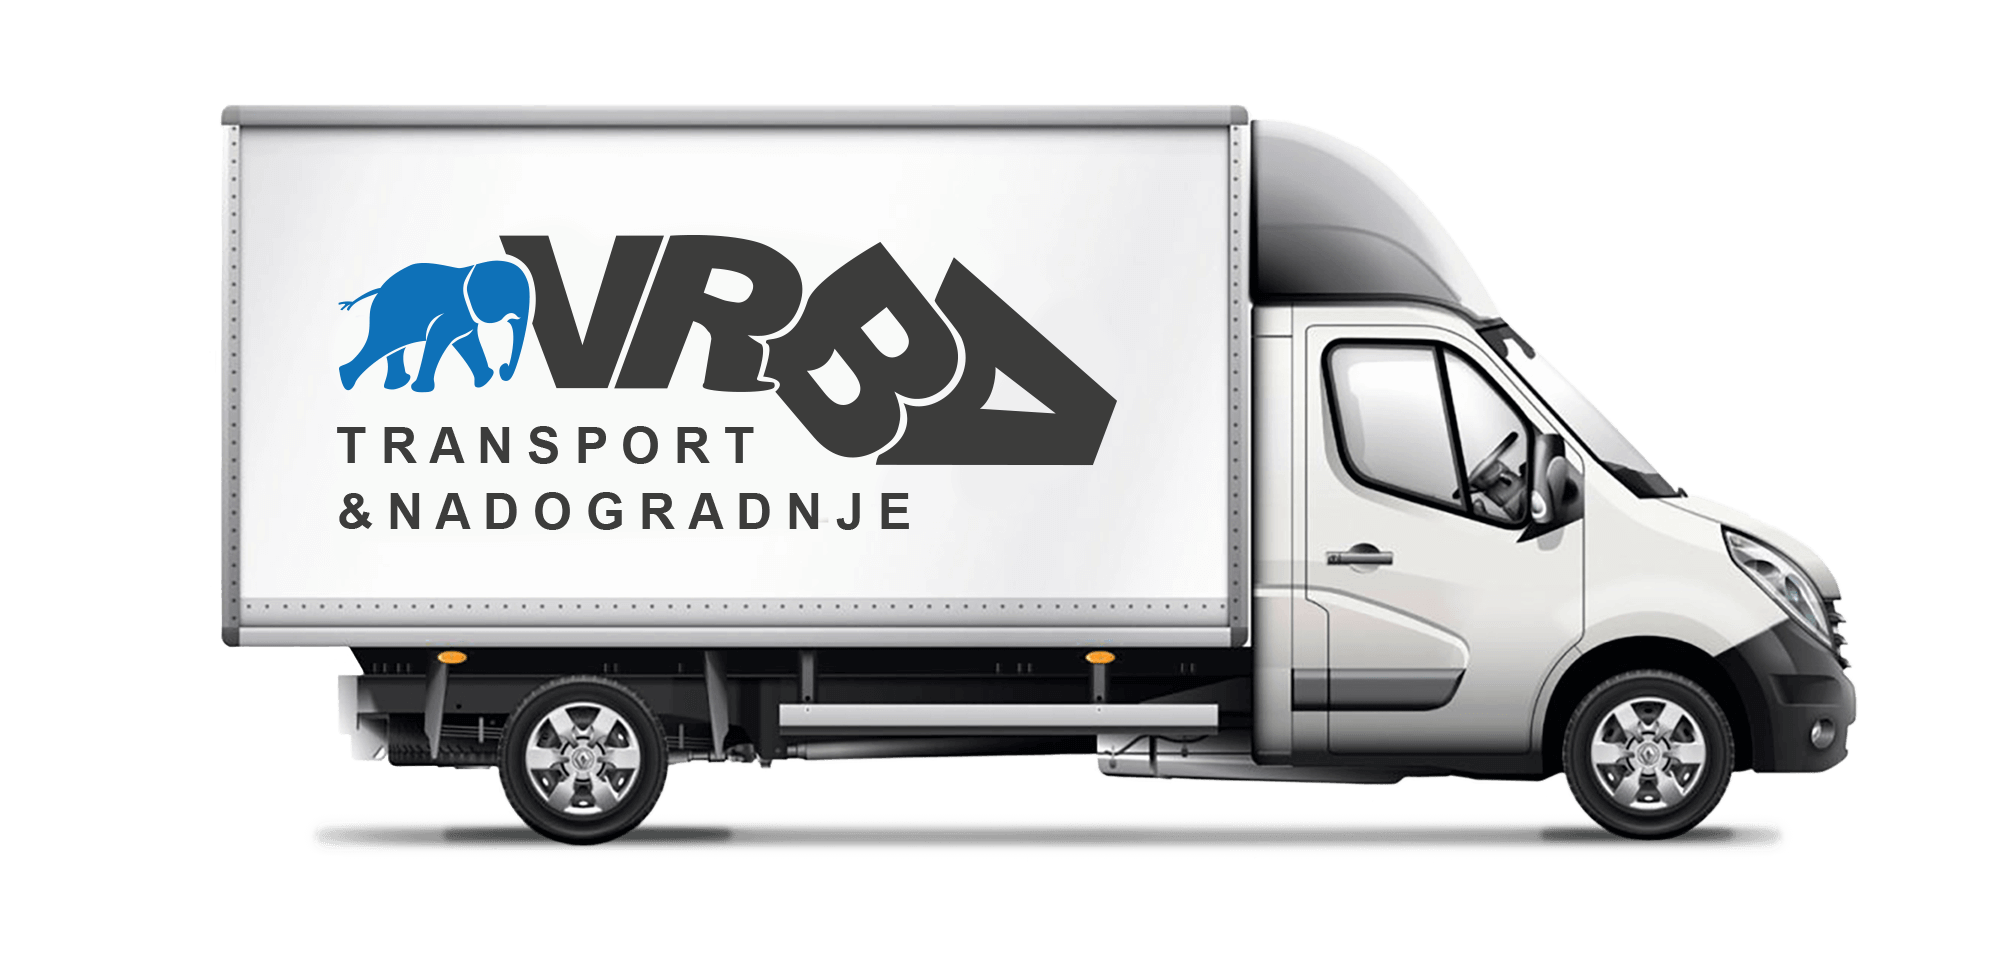 Prijevoz robe u Švicarsku i EU. Profesionalne nadogradnje vozila.